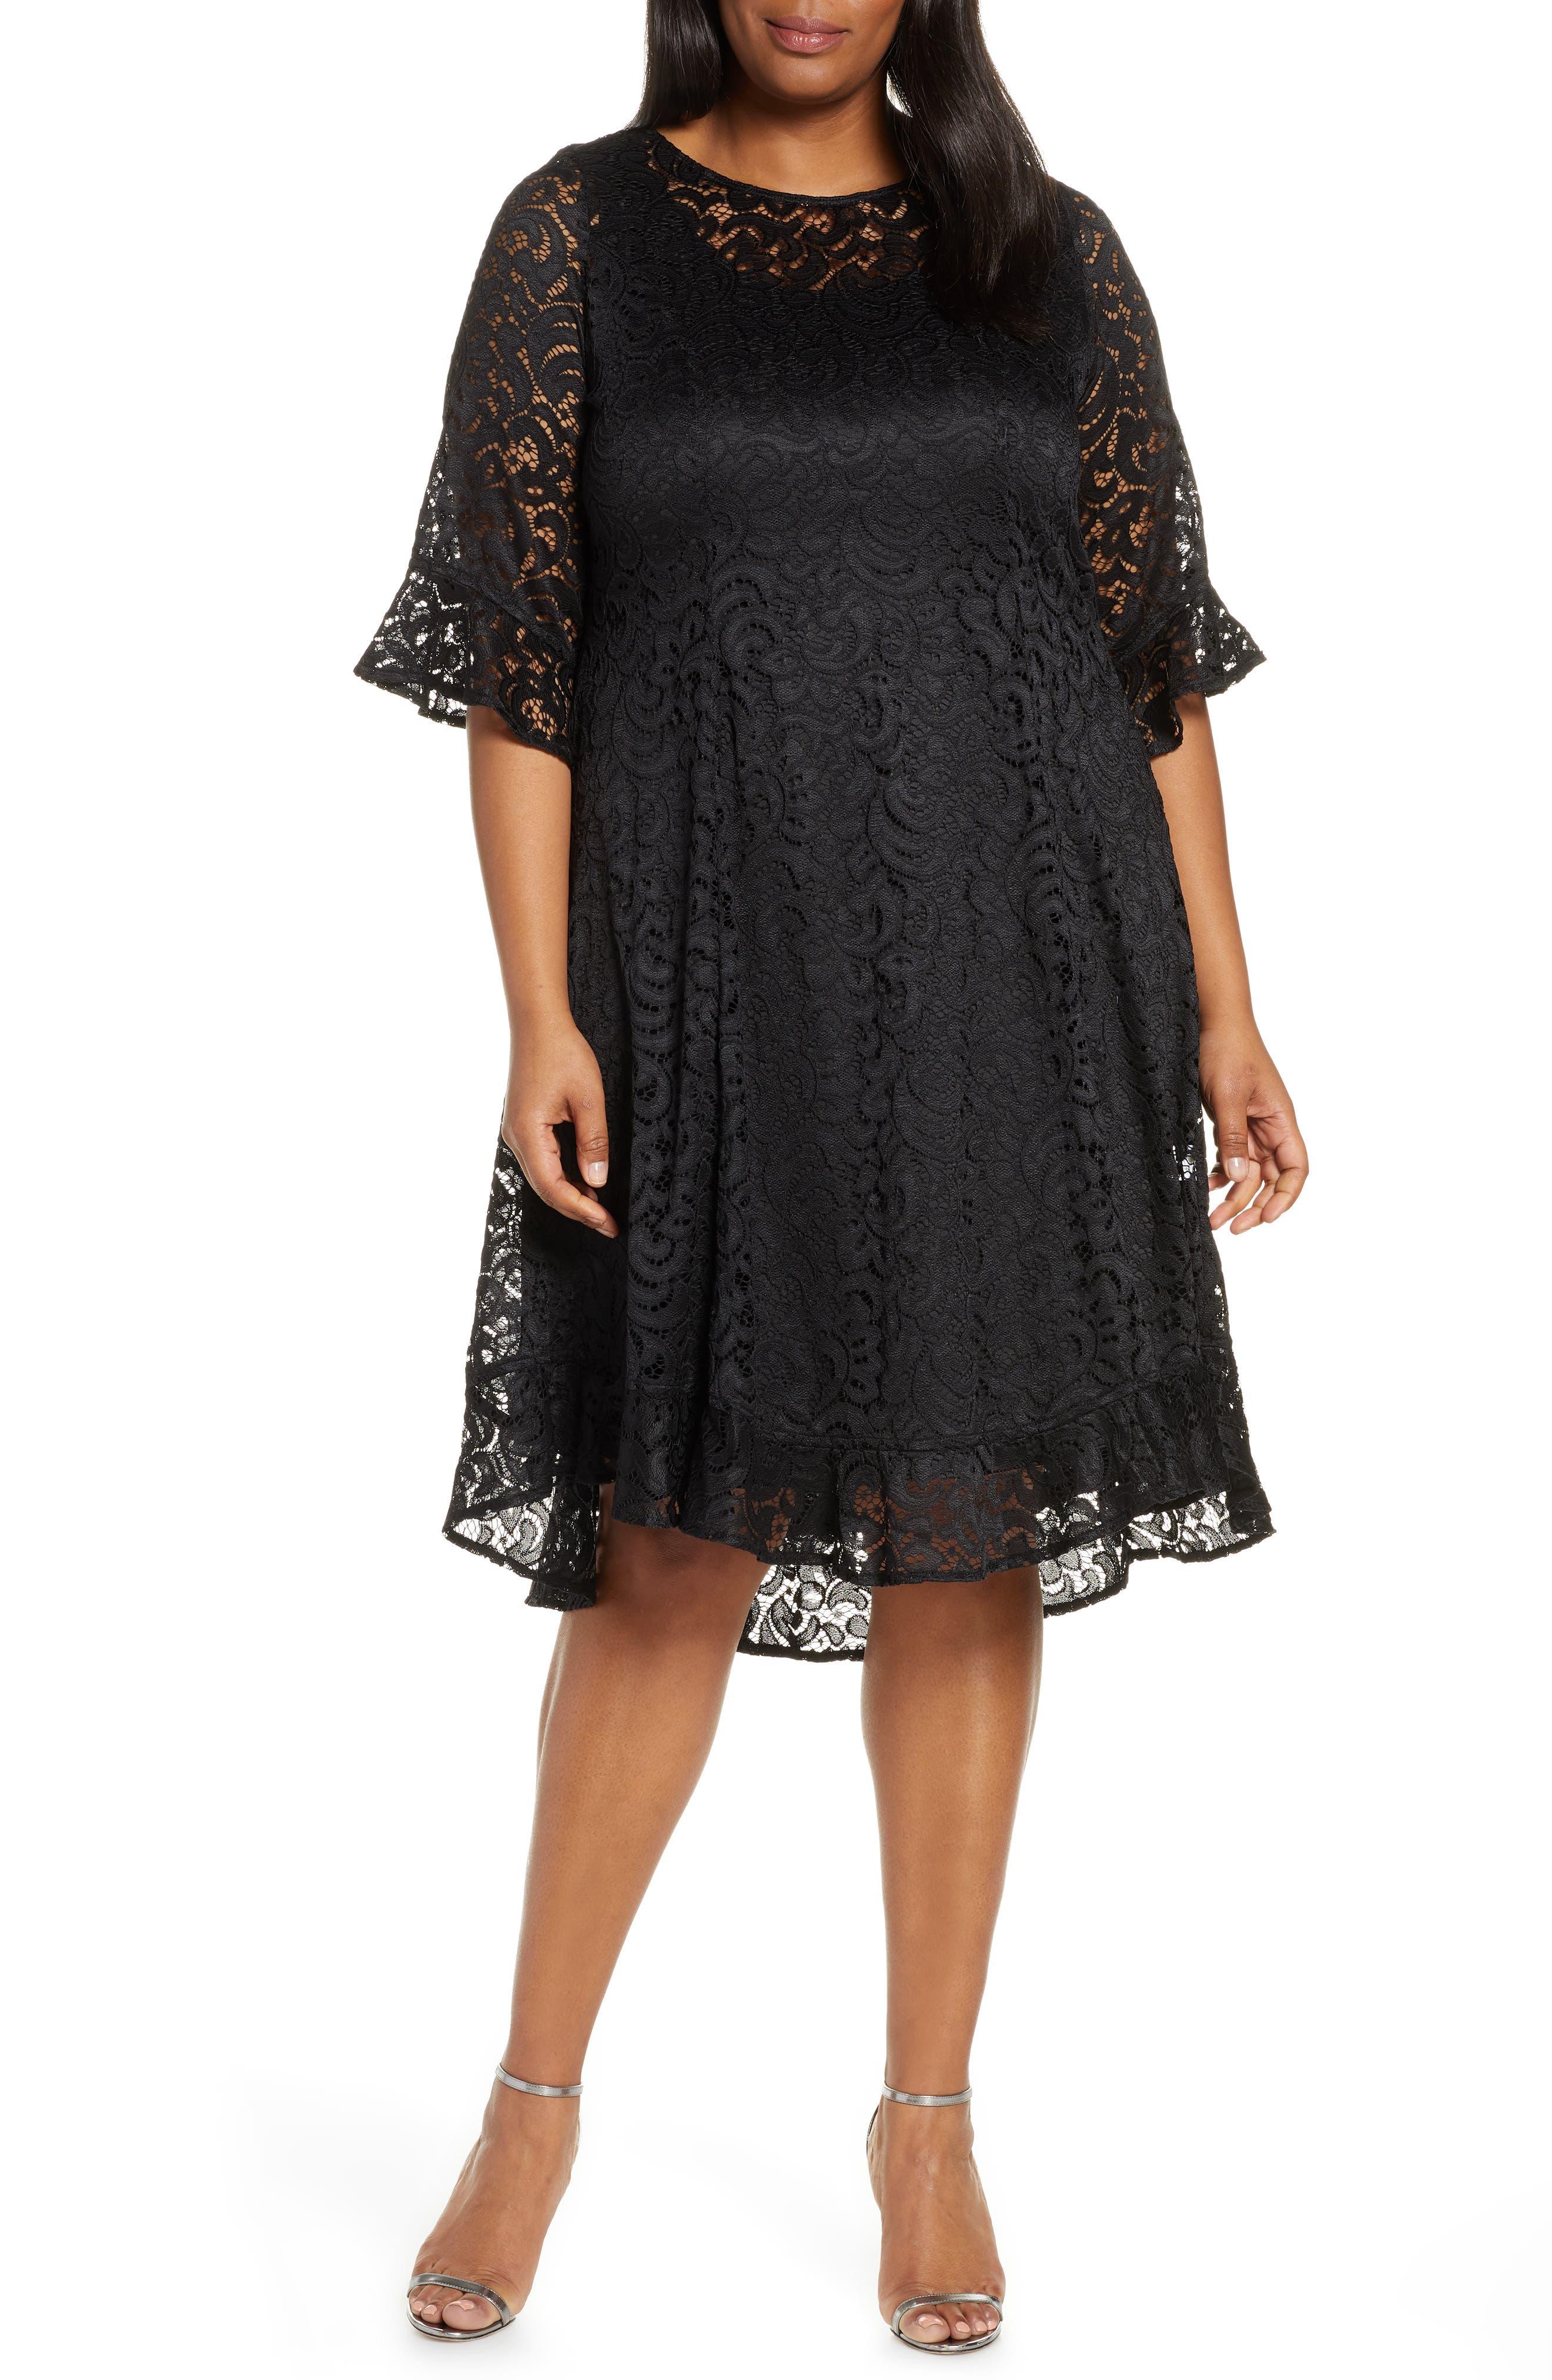 Plus Size Kiyonna Livi Lace Cocktail Dress, Black